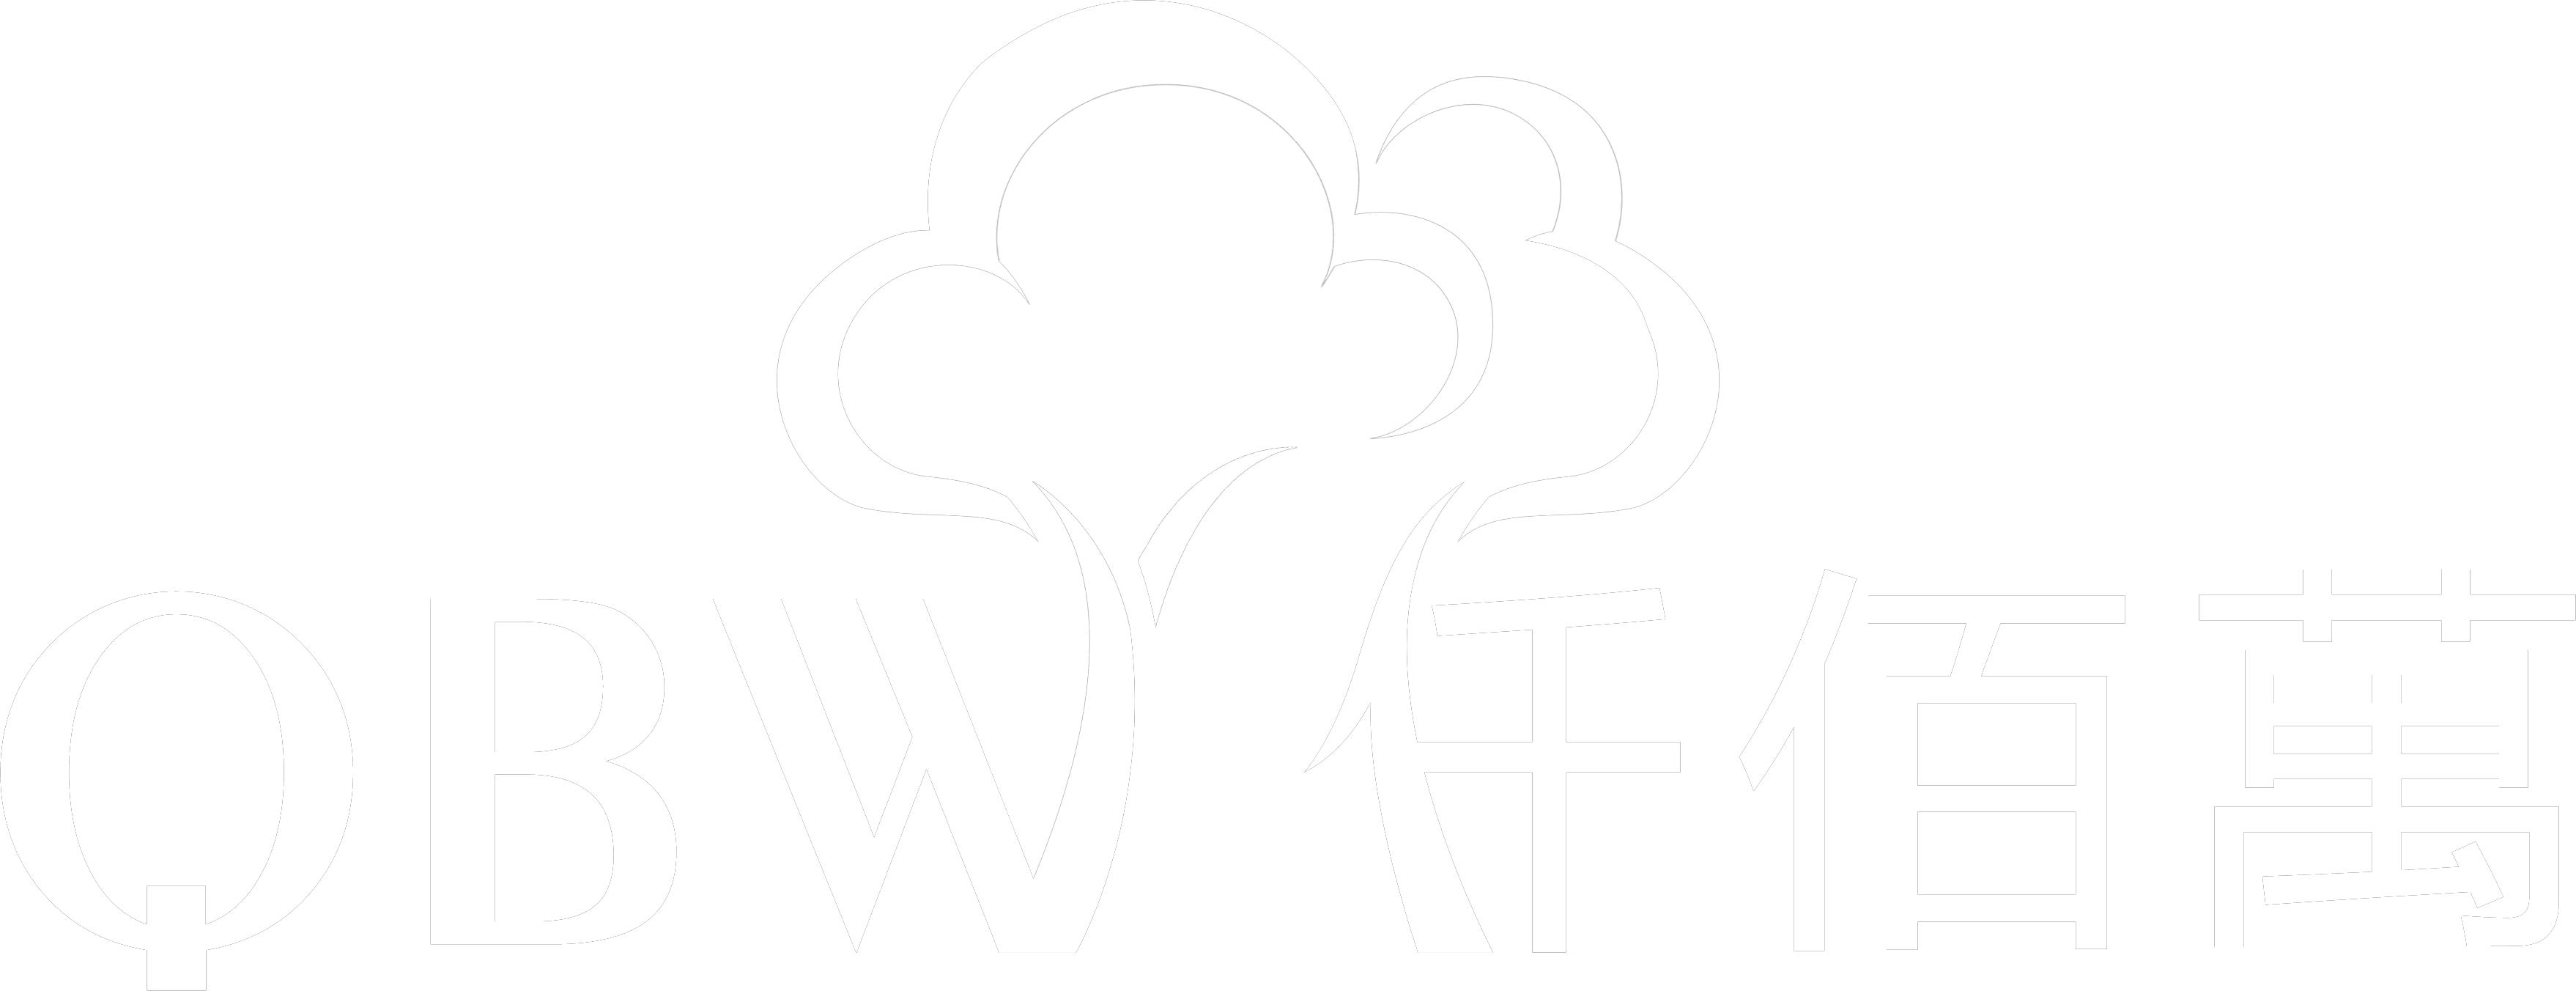 千百萬-logo白色